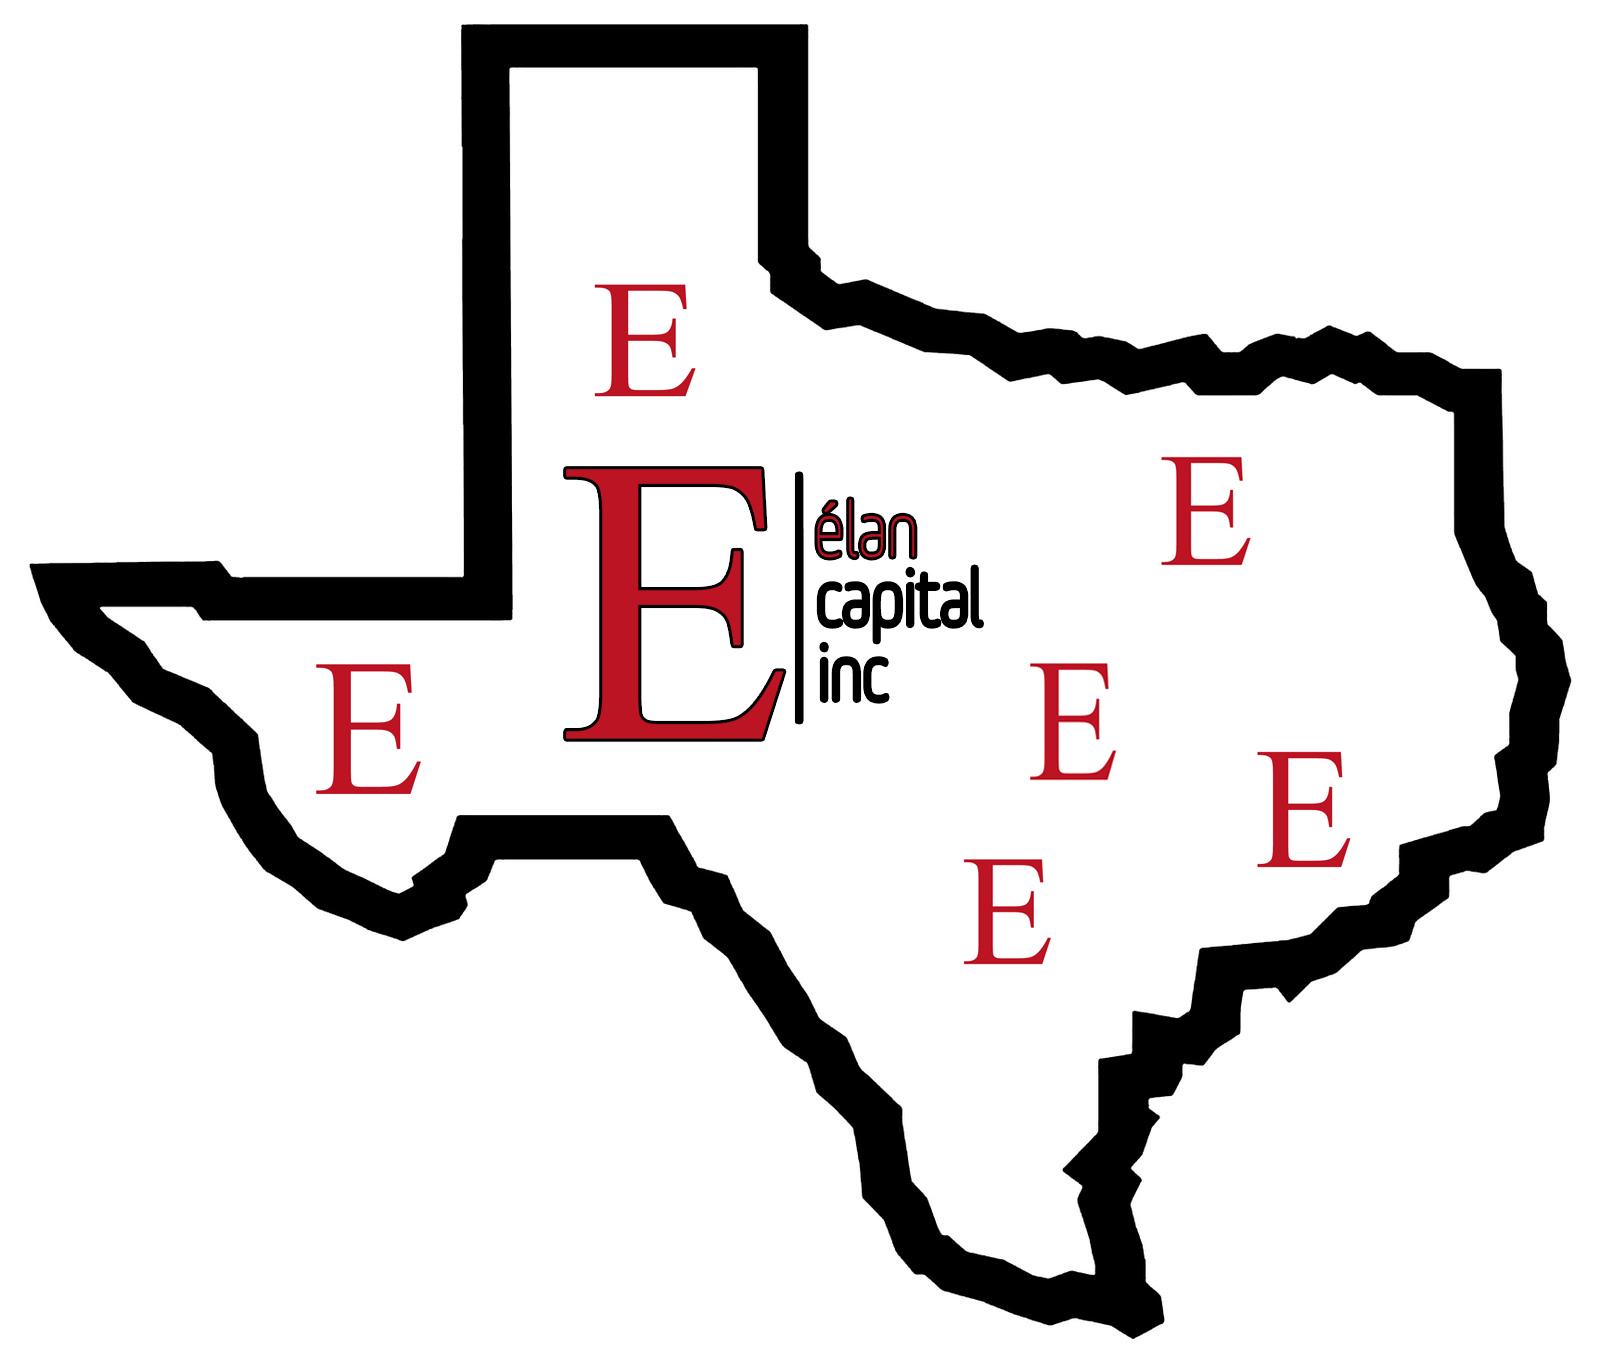 Commercial Loans - Austin Texas - From a lender in Texas - Elan